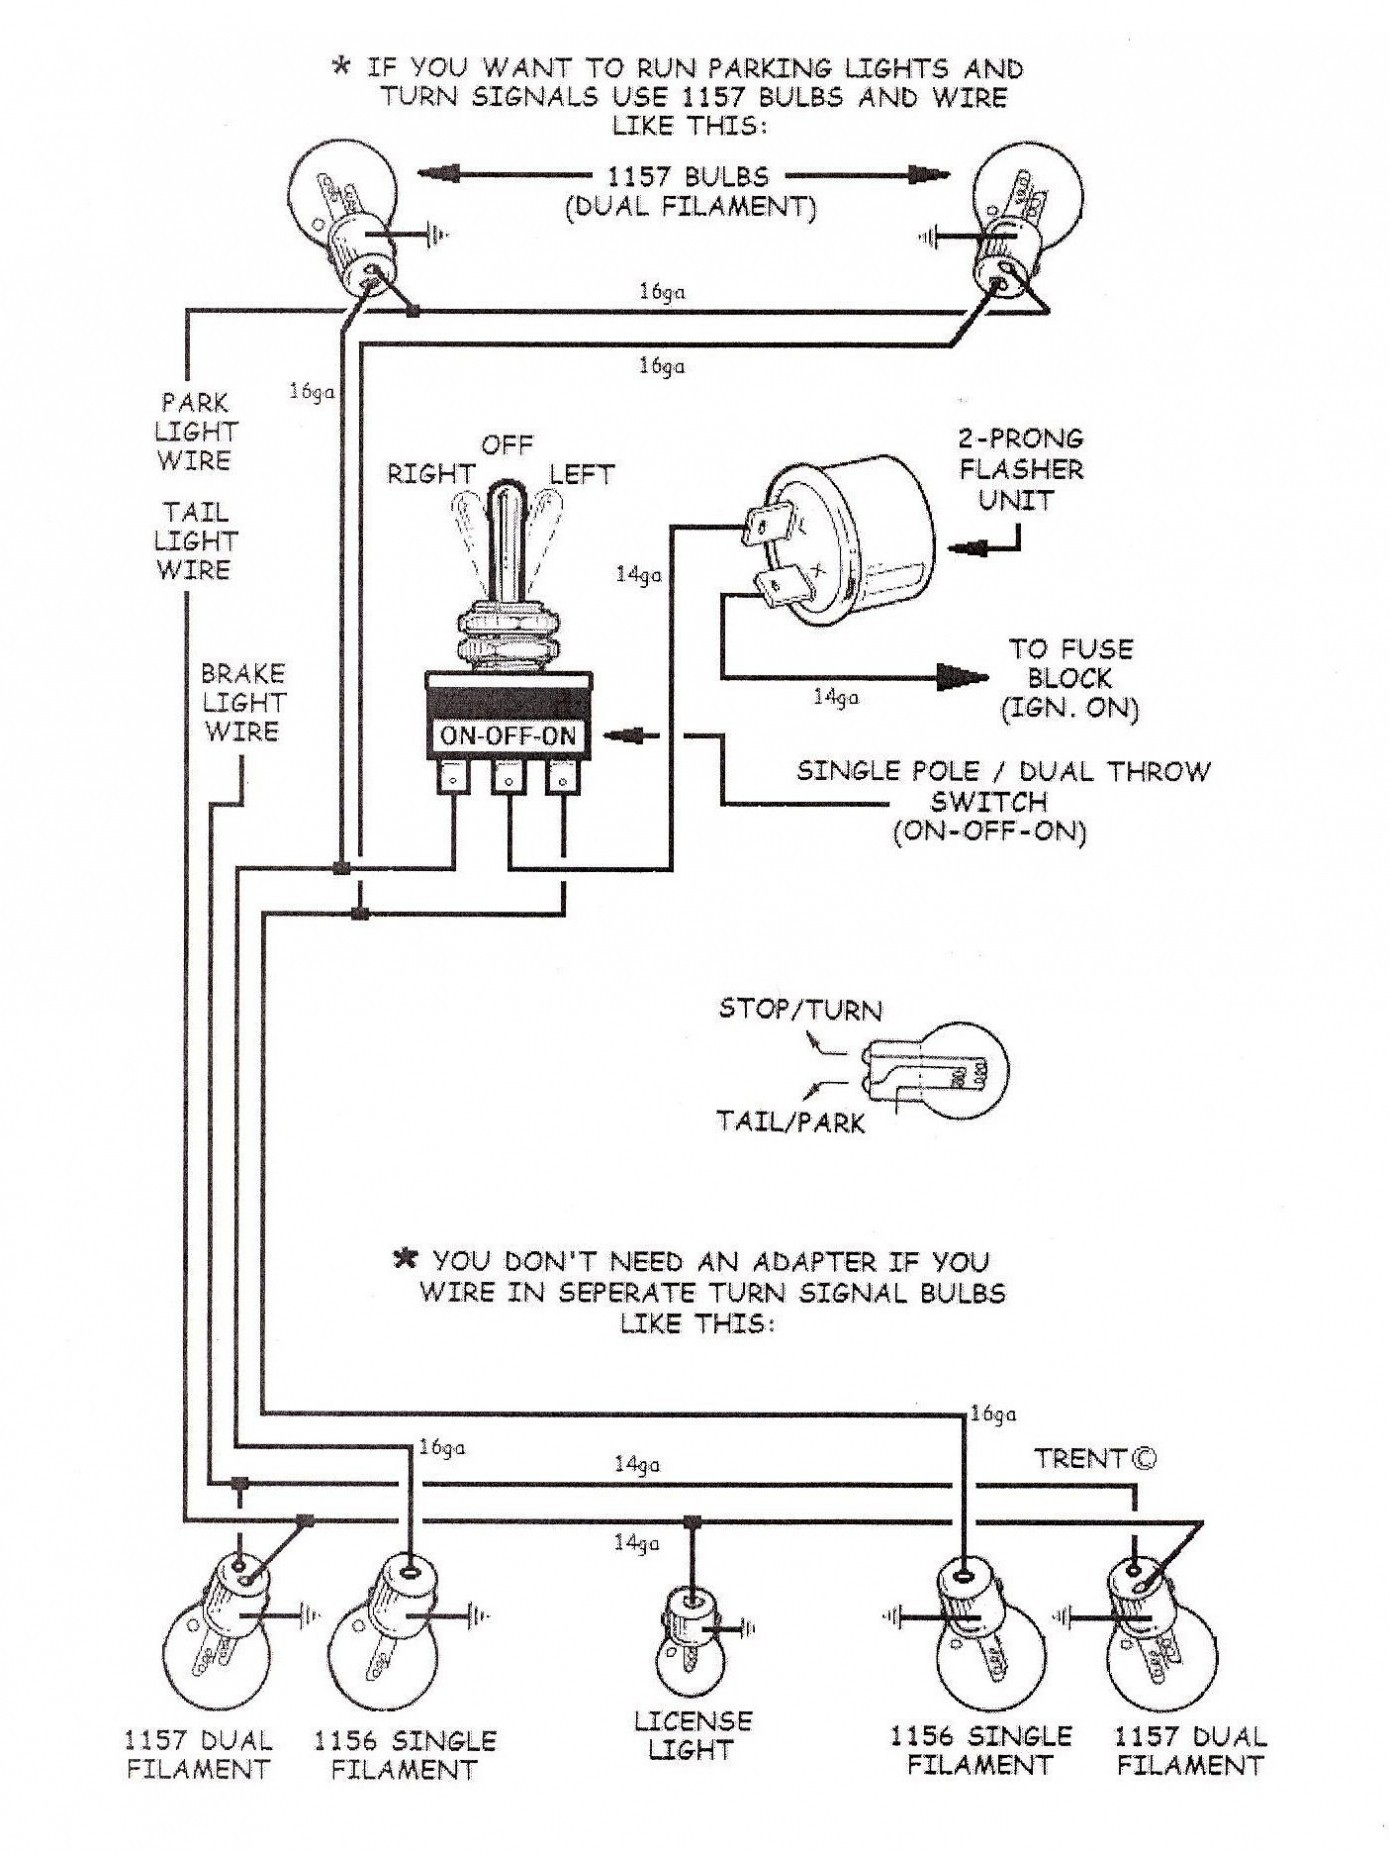 Turn Signal Diagram Wiring Diagram A House New Lamp Wiring Diagram – Turn Signal Of Turn Signal Diagram